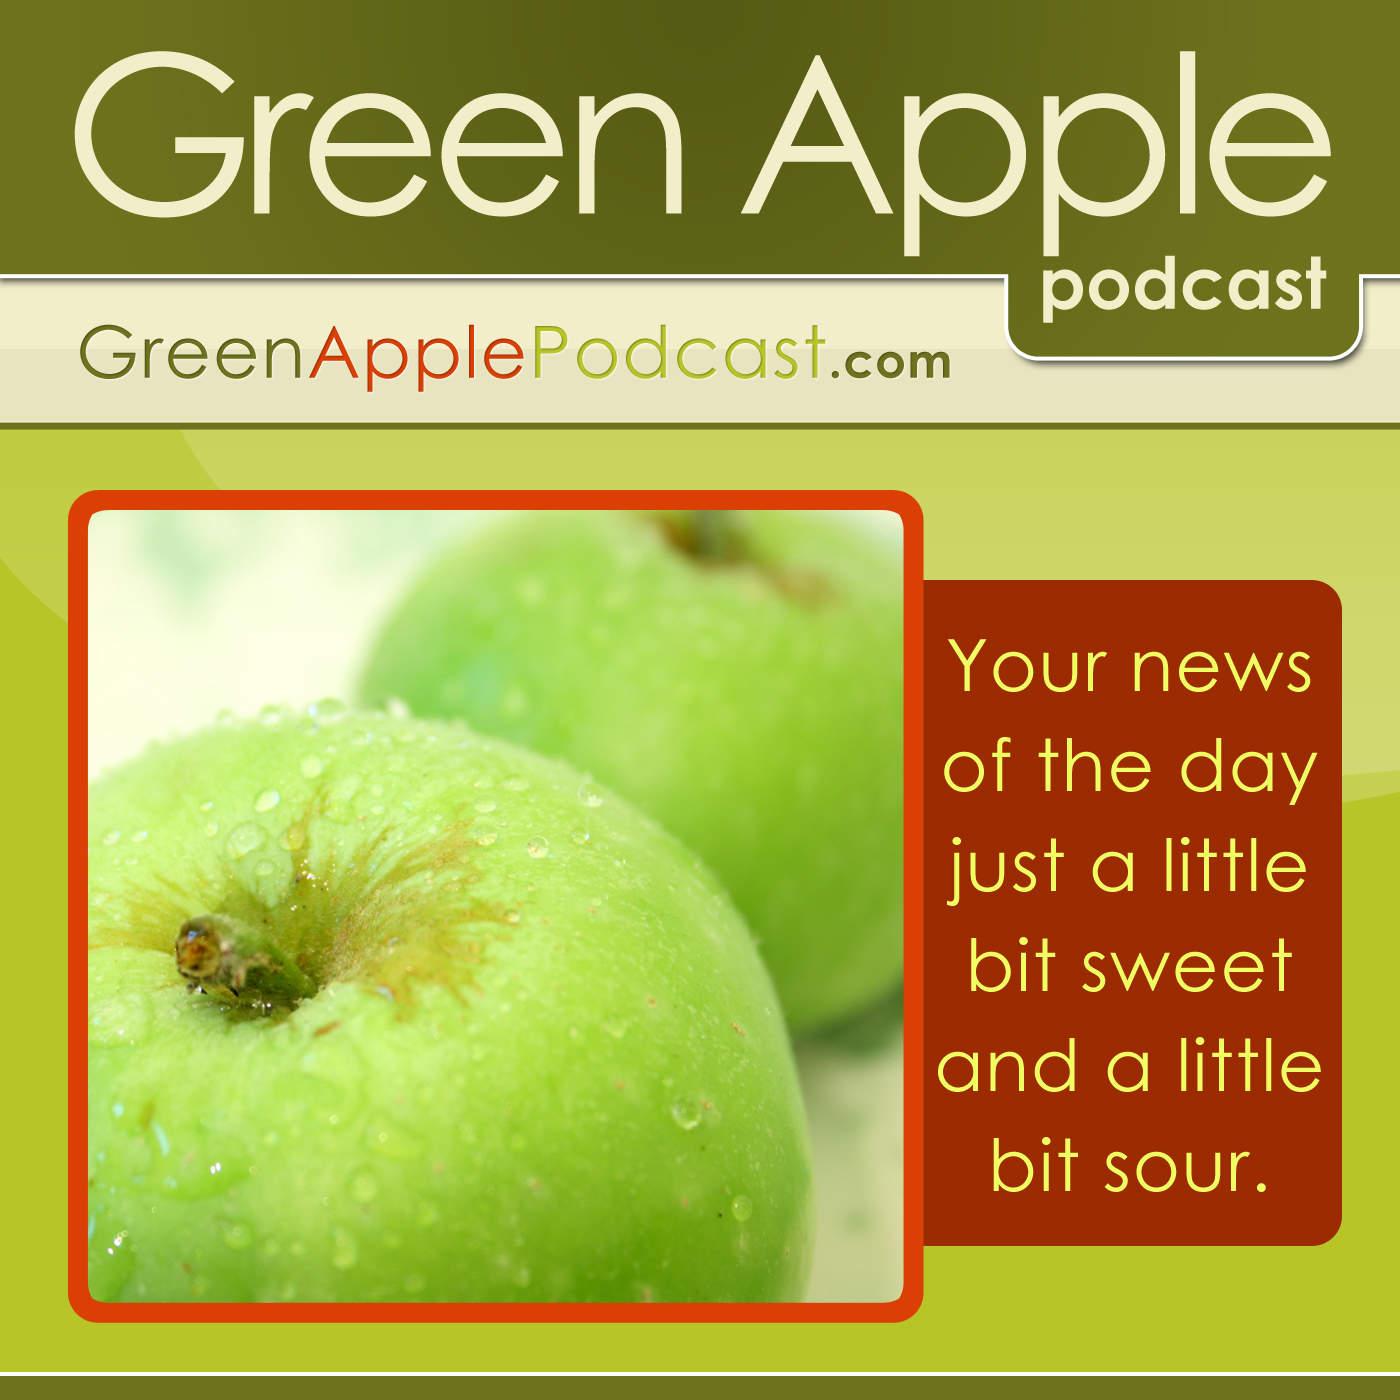 GreenApplePodcast